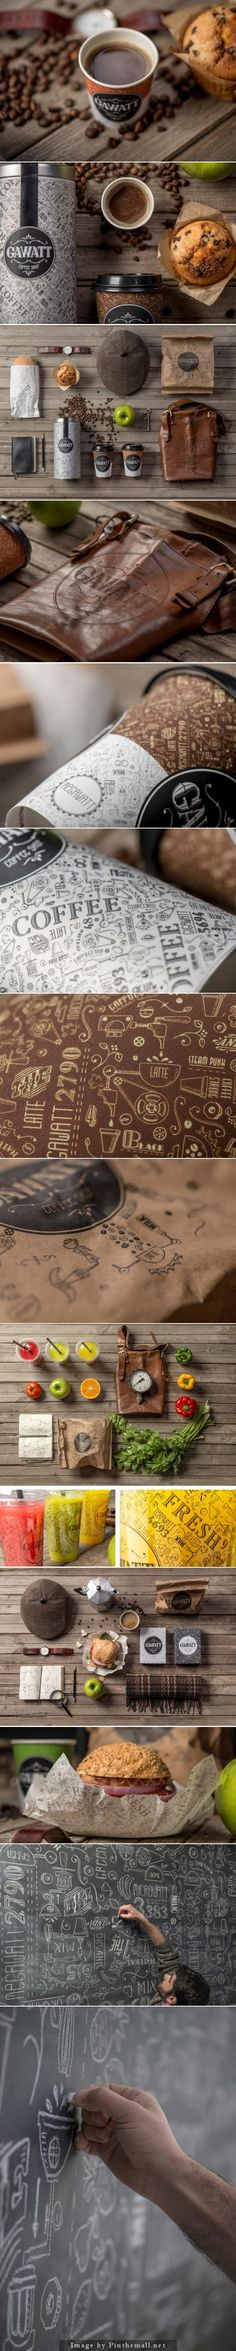 Gawatt Take-out Coffee-shop Agency: Backbone branding Art director: Stepan Azaryan Designer: Karen Gevorgyan, Illustartor: Armenak Grigoryan Client: Gawatt Country: Armenia Brand Identity Design, Graphic Design Branding, Corporate Design, Logo Design, Corporate Identity, Coffee Shop Branding, Coffee Logo, Packaging Design Inspiration, Graphic Design Inspiration